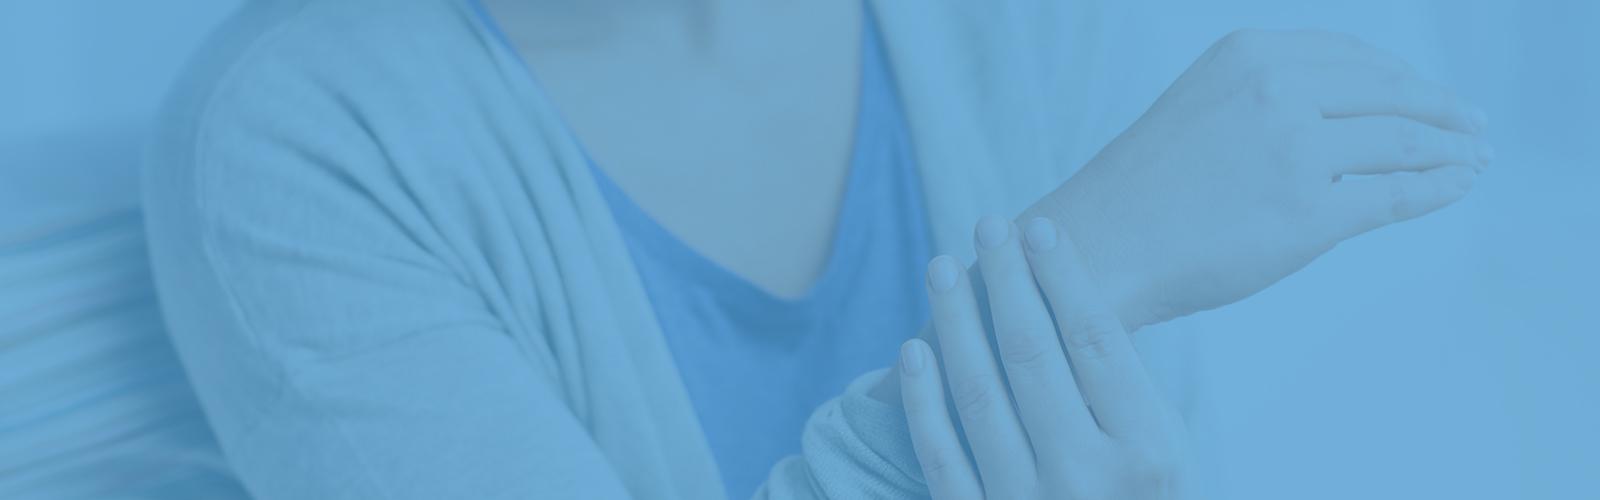 Common Wrist Injuries